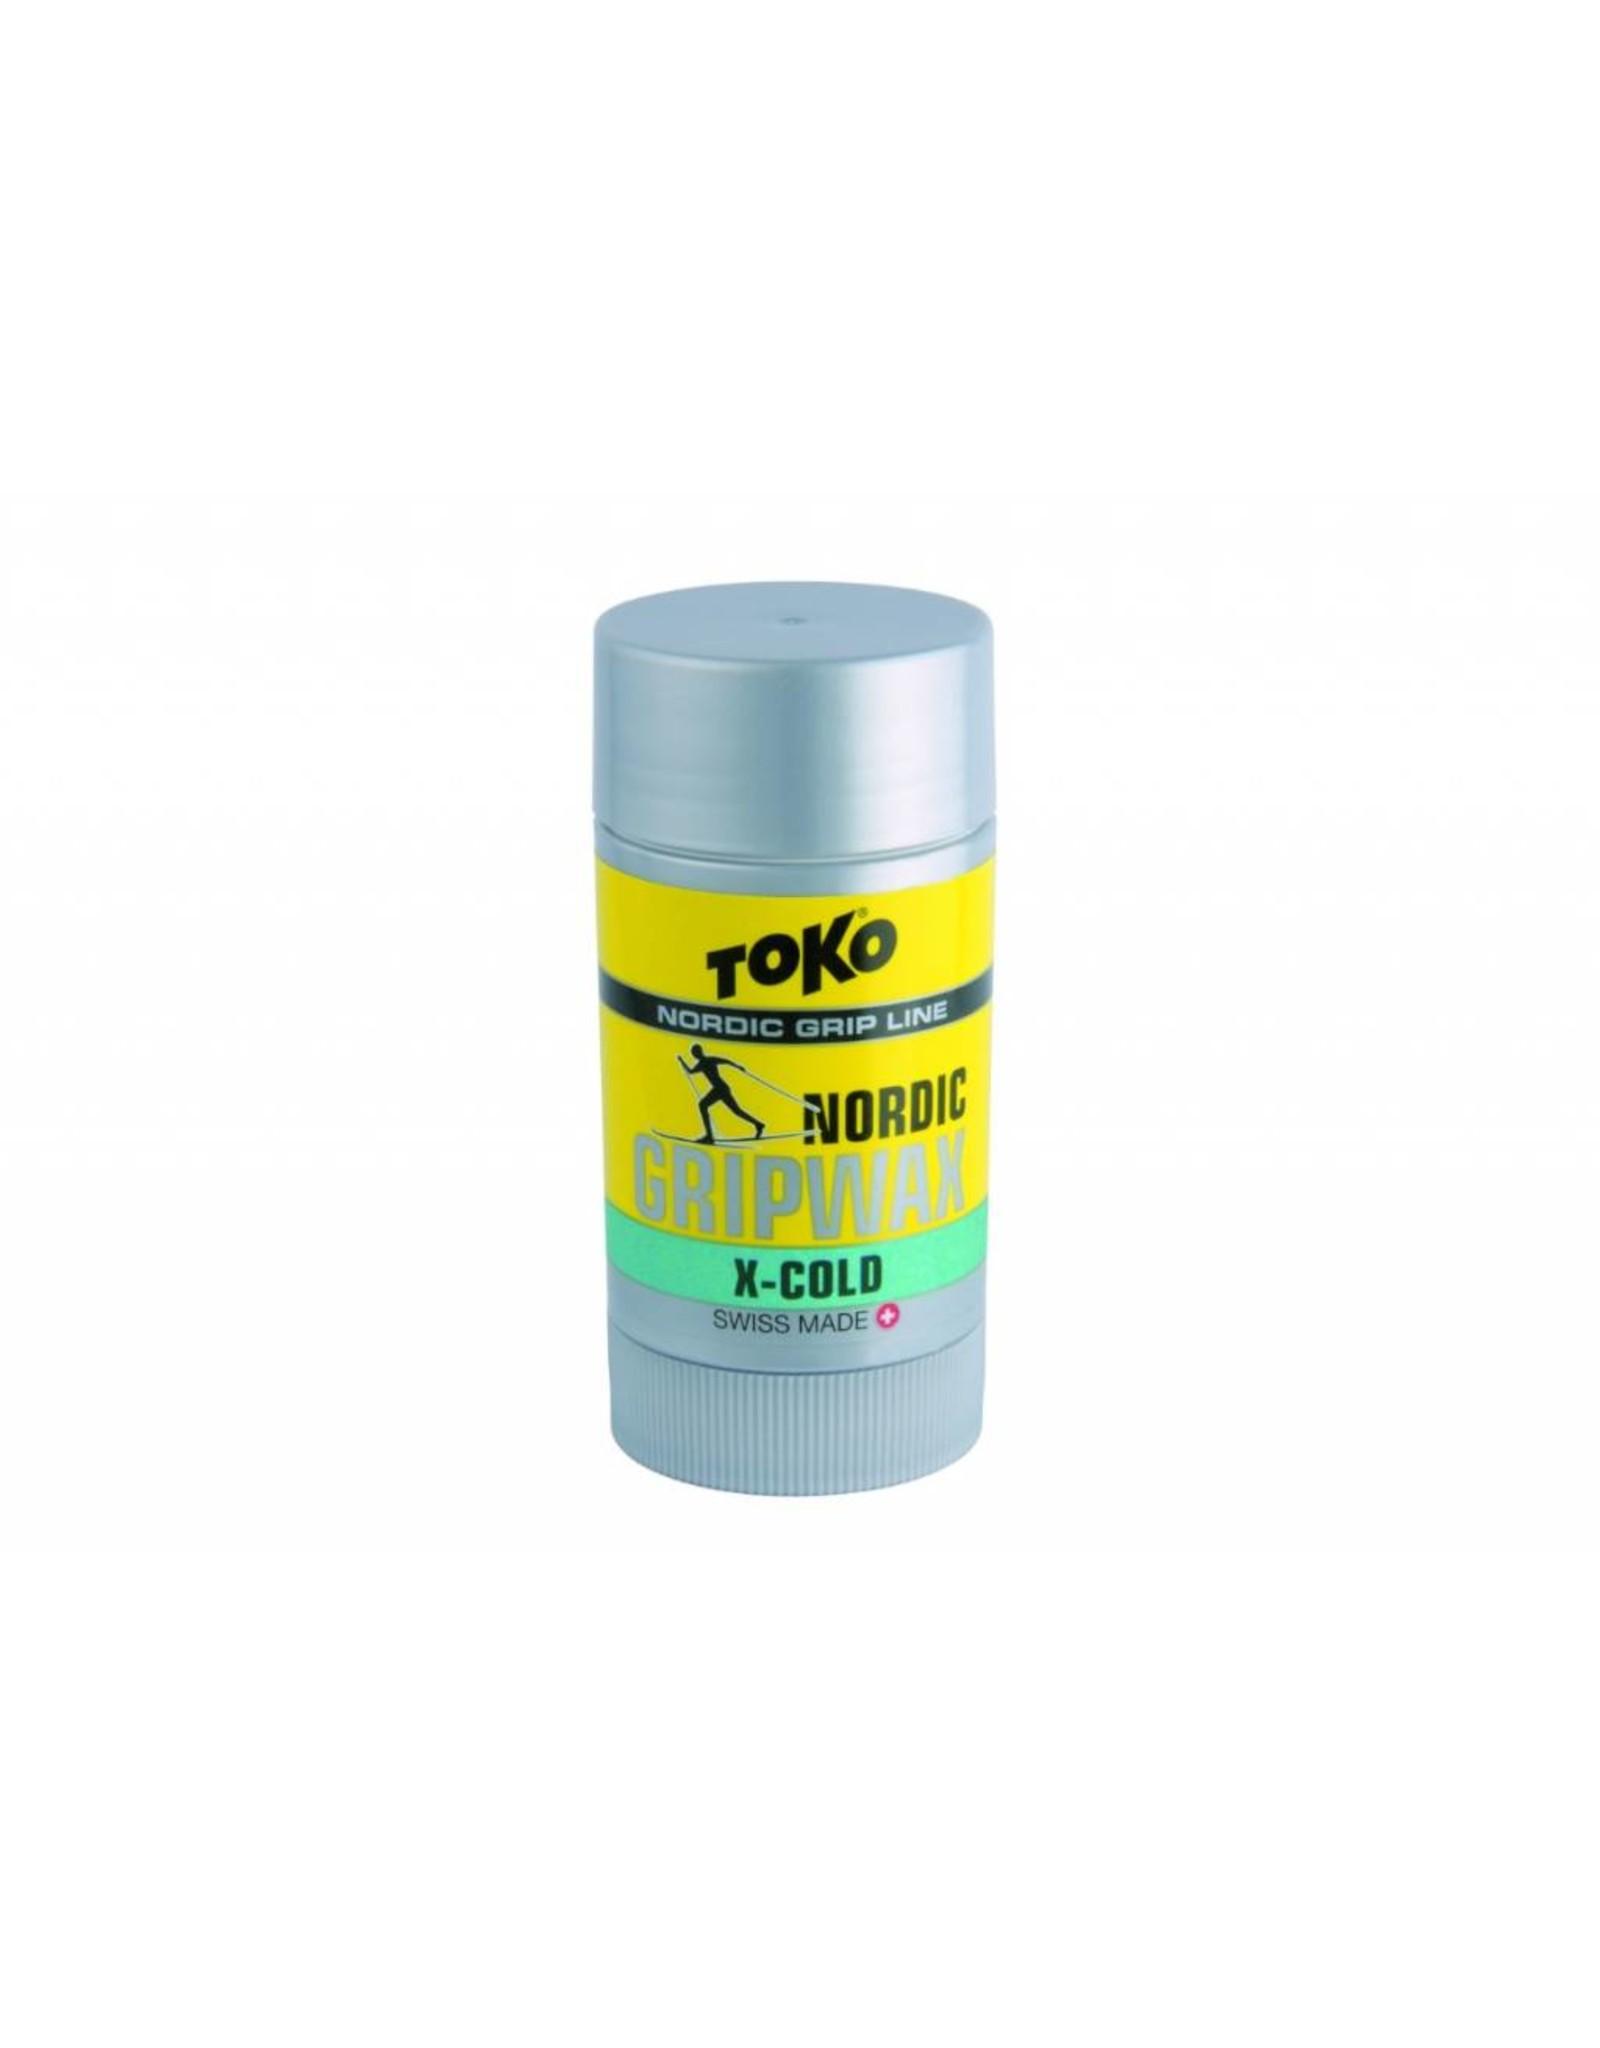 Toko Grip Wax X-Cold 25g